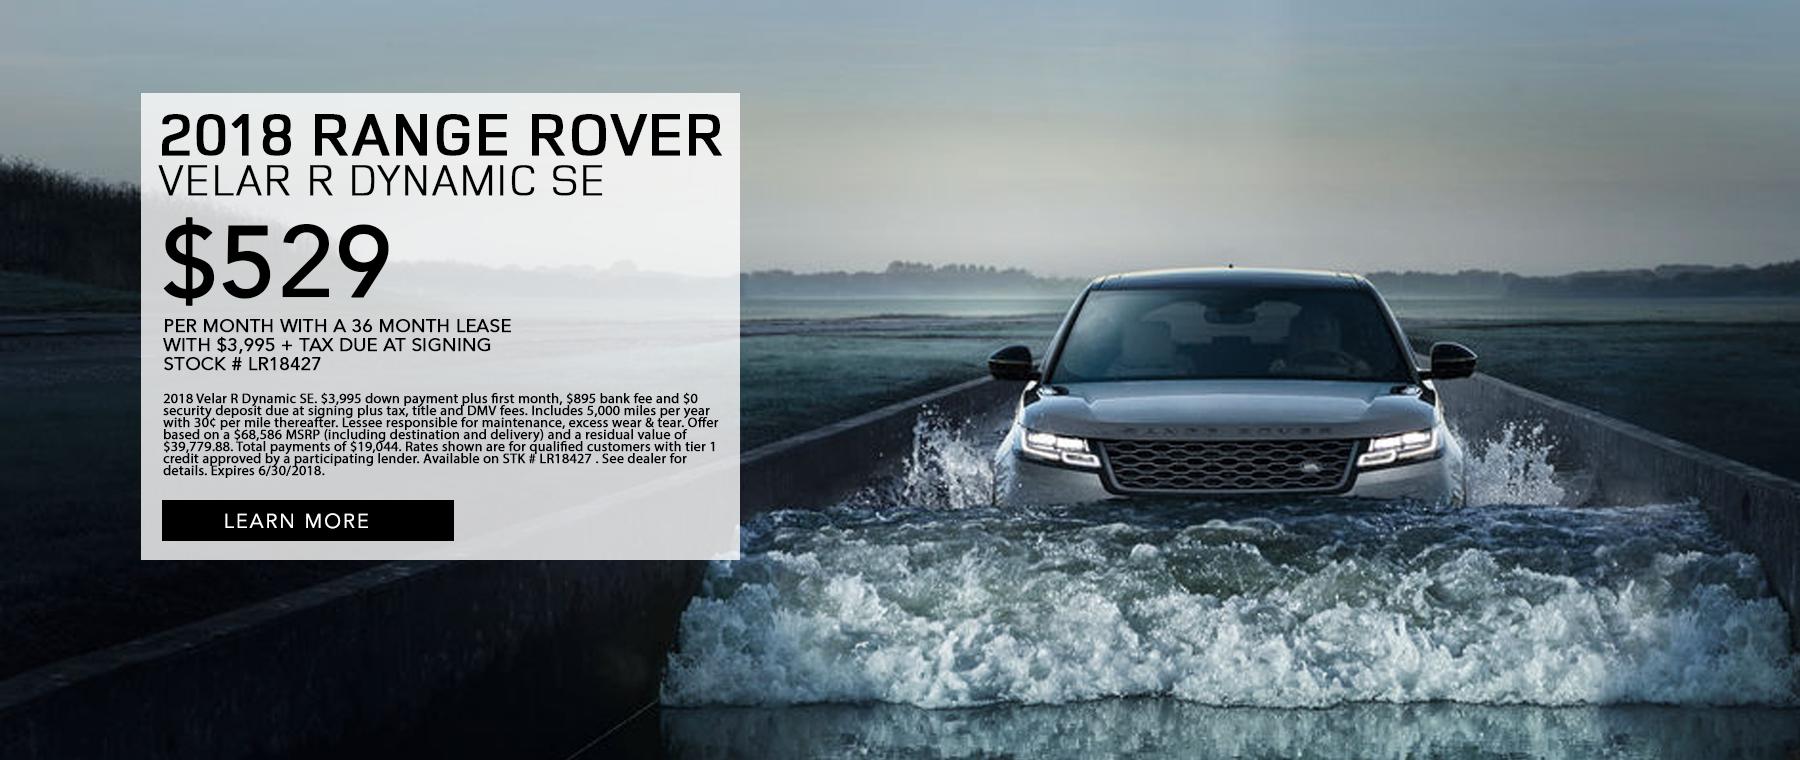 range luxury used super black htm sport rover santorini dealers main hse land c ny lux landrover l clean